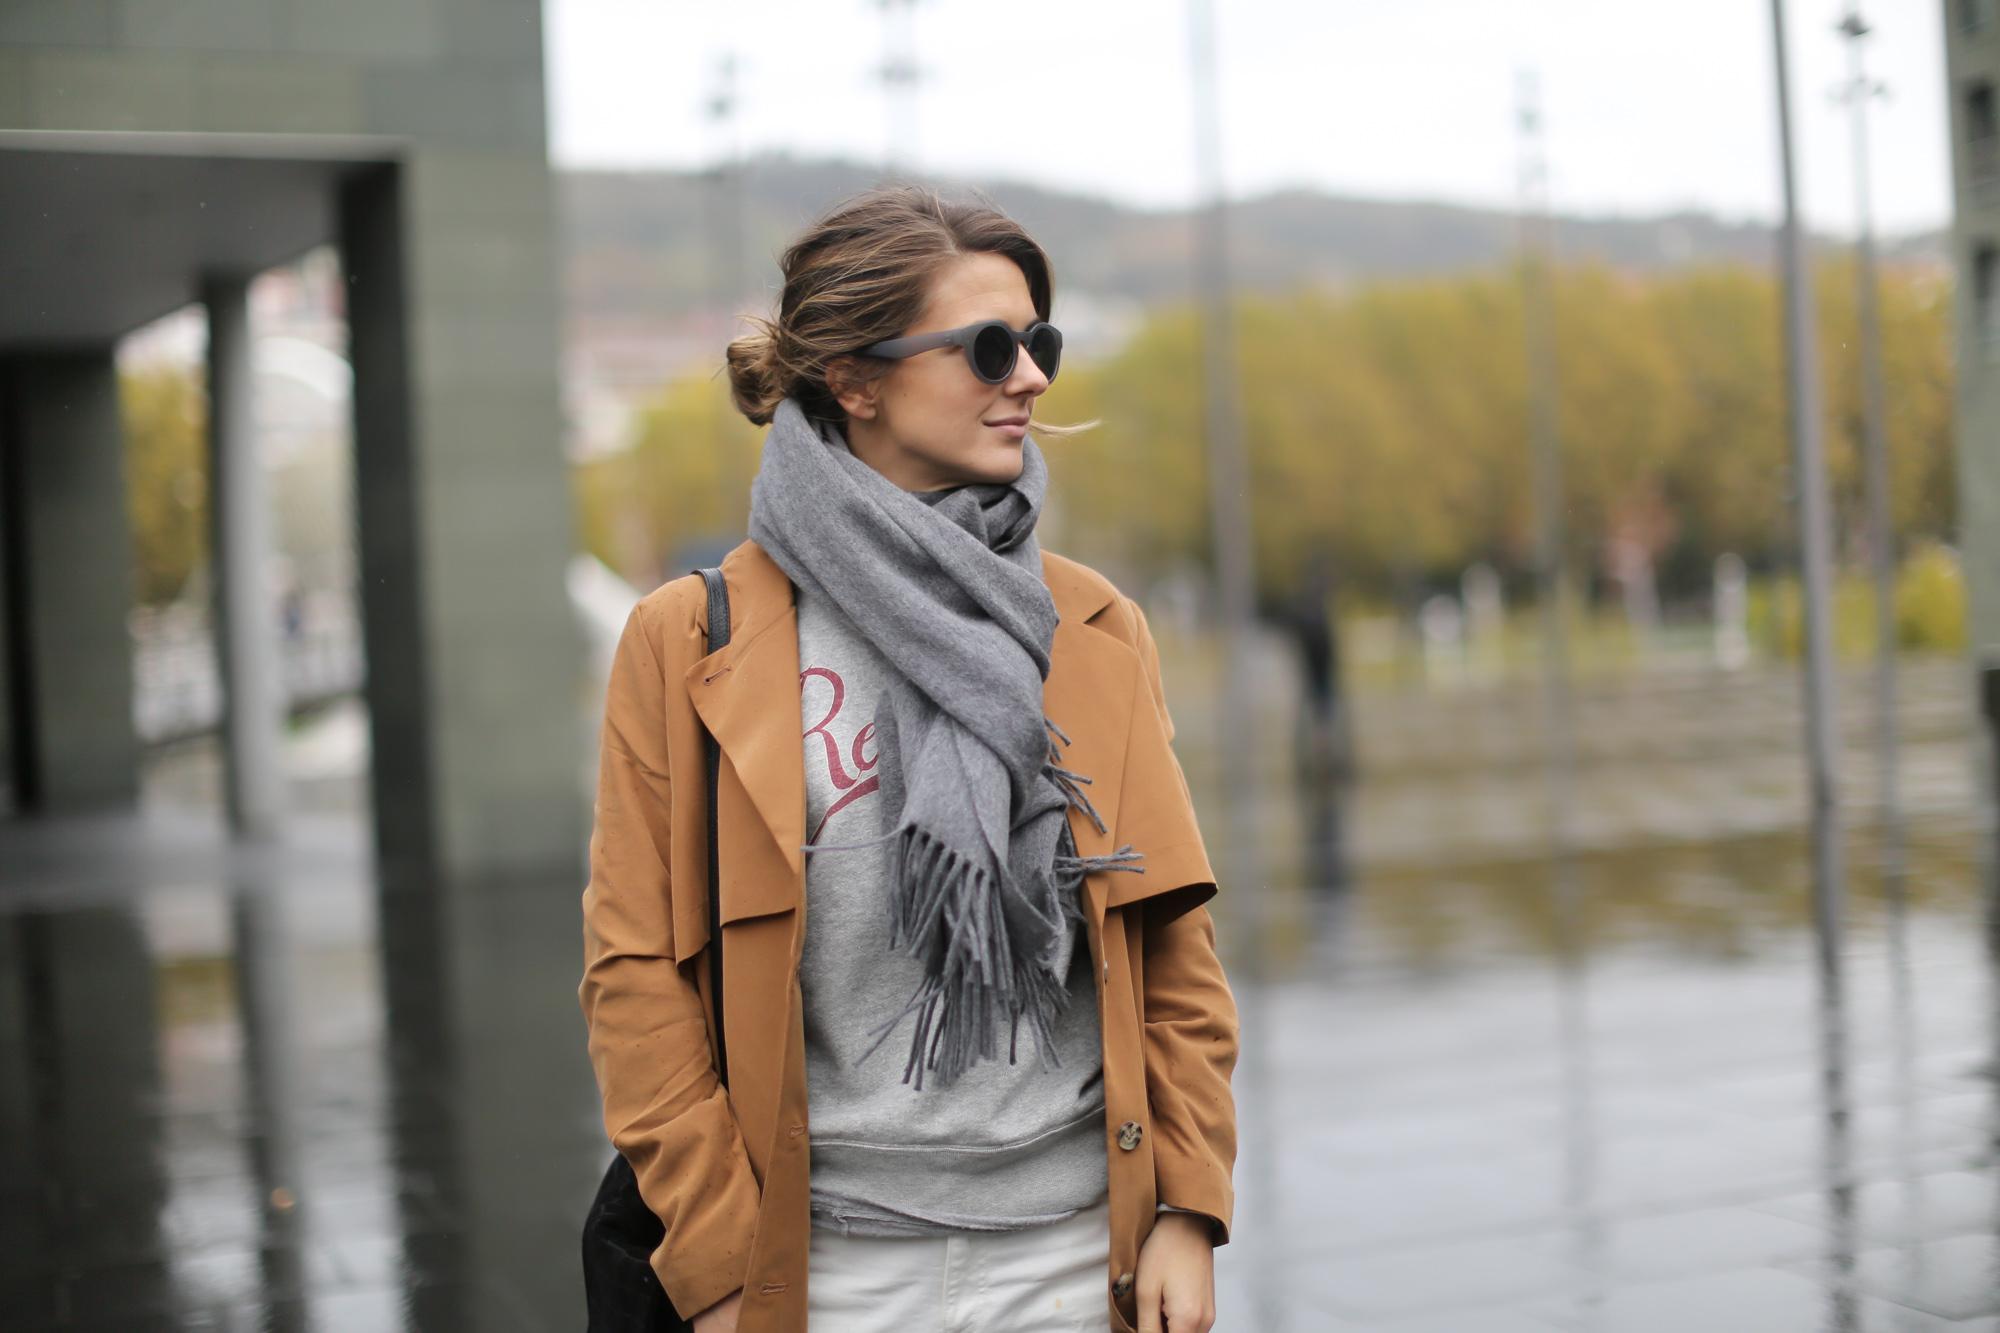 Clochet-streetstyle-isabel-marant-etoile-revolution-sweatshirt-adidas-stan-smith-monki-trench-coat-8